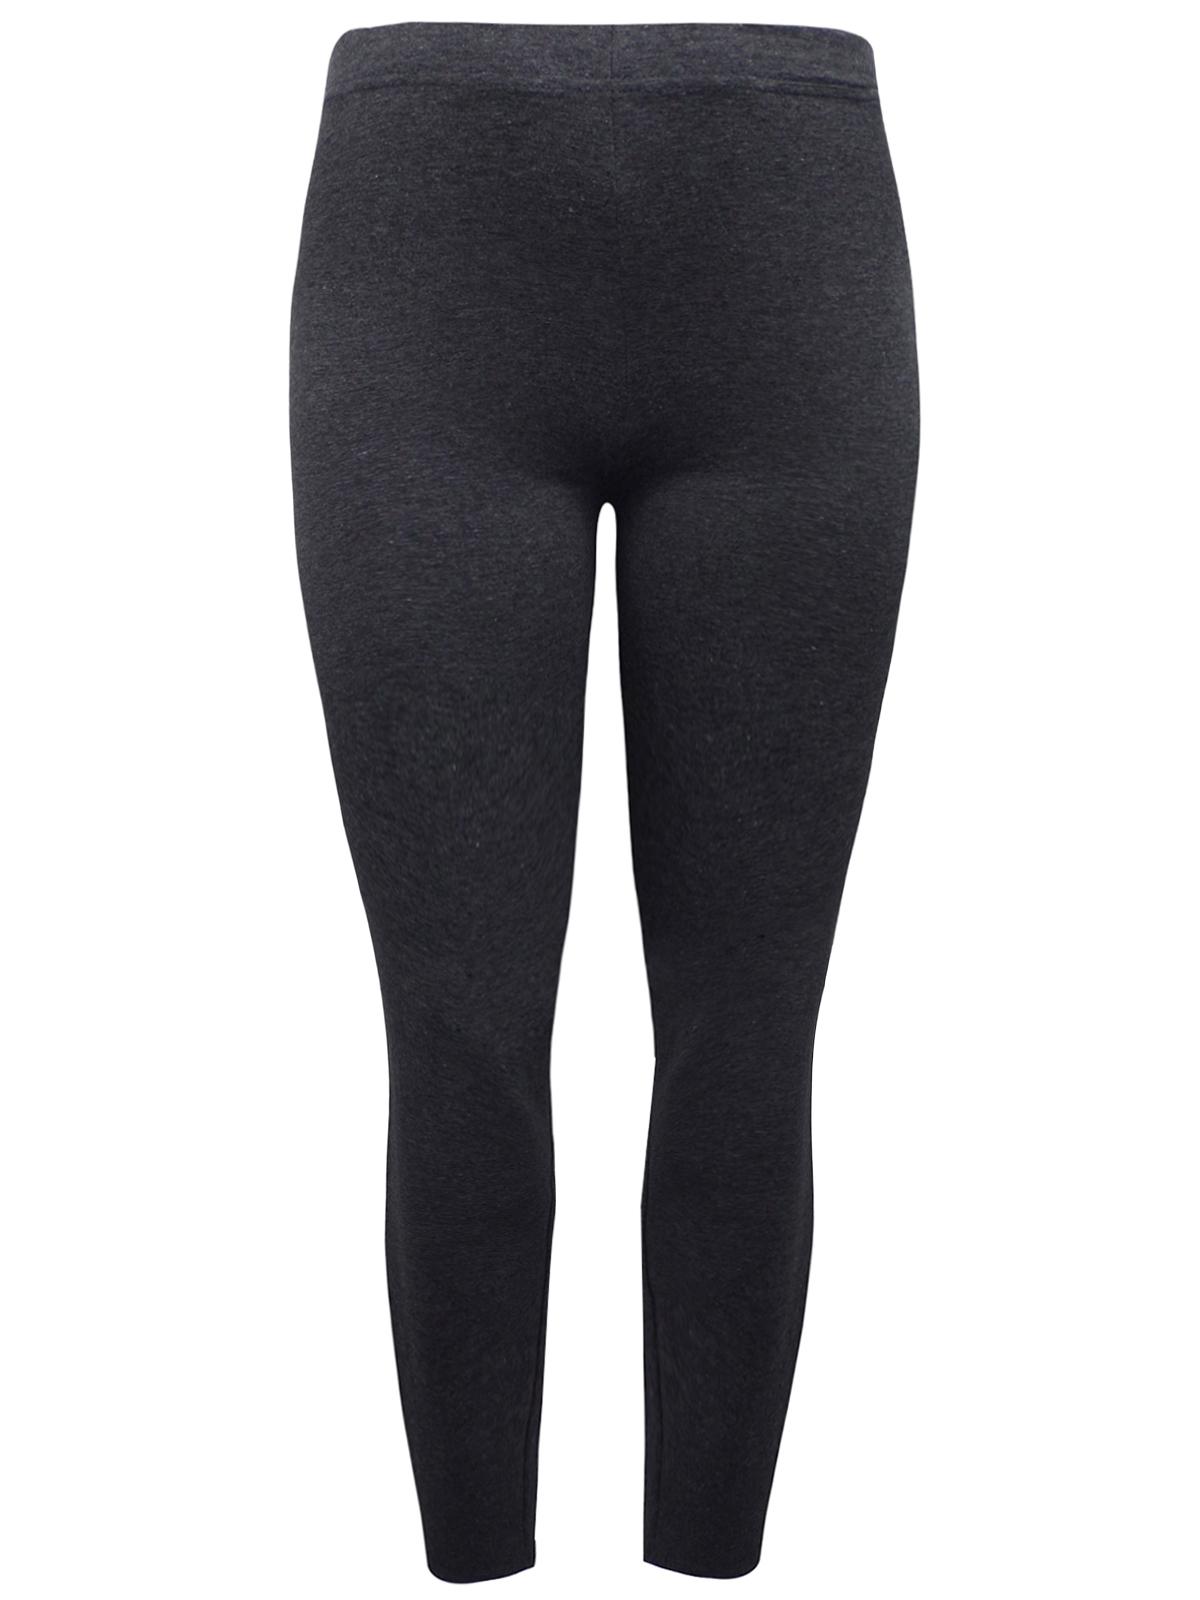 2fa5a59d02b6c0 RedTag CHARCOAL Melange Cotton Rich Opaque Full Length Leggings - Plus Size  18 to 26. SKU[33285]